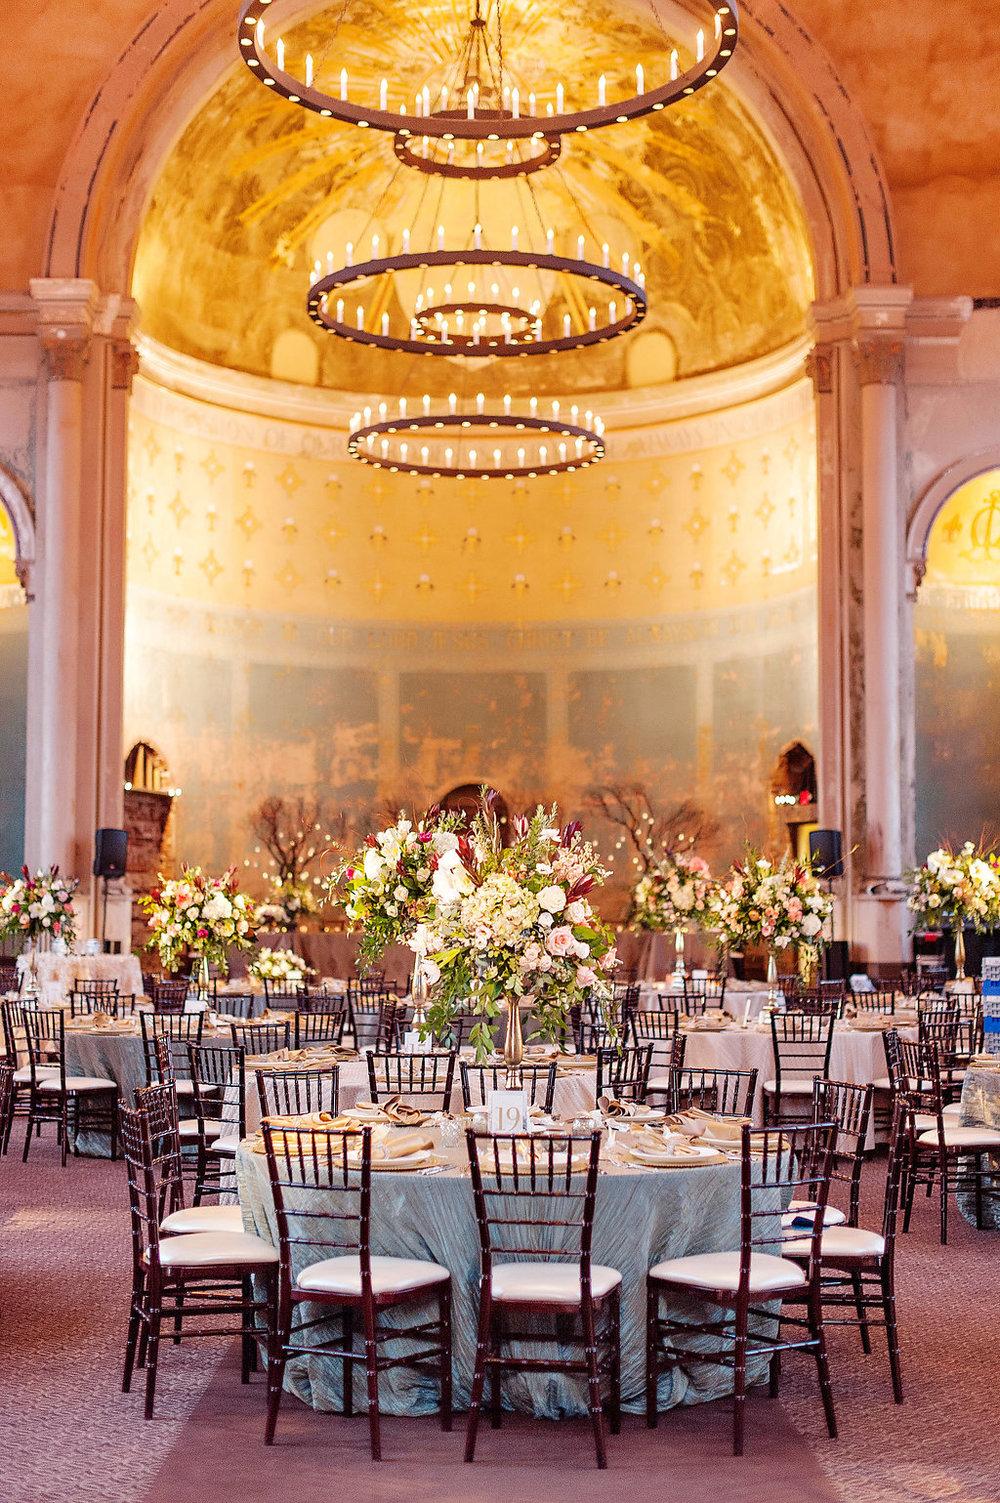 Monastery Event Center wedding reception. Photo Kortnee Kate Photography